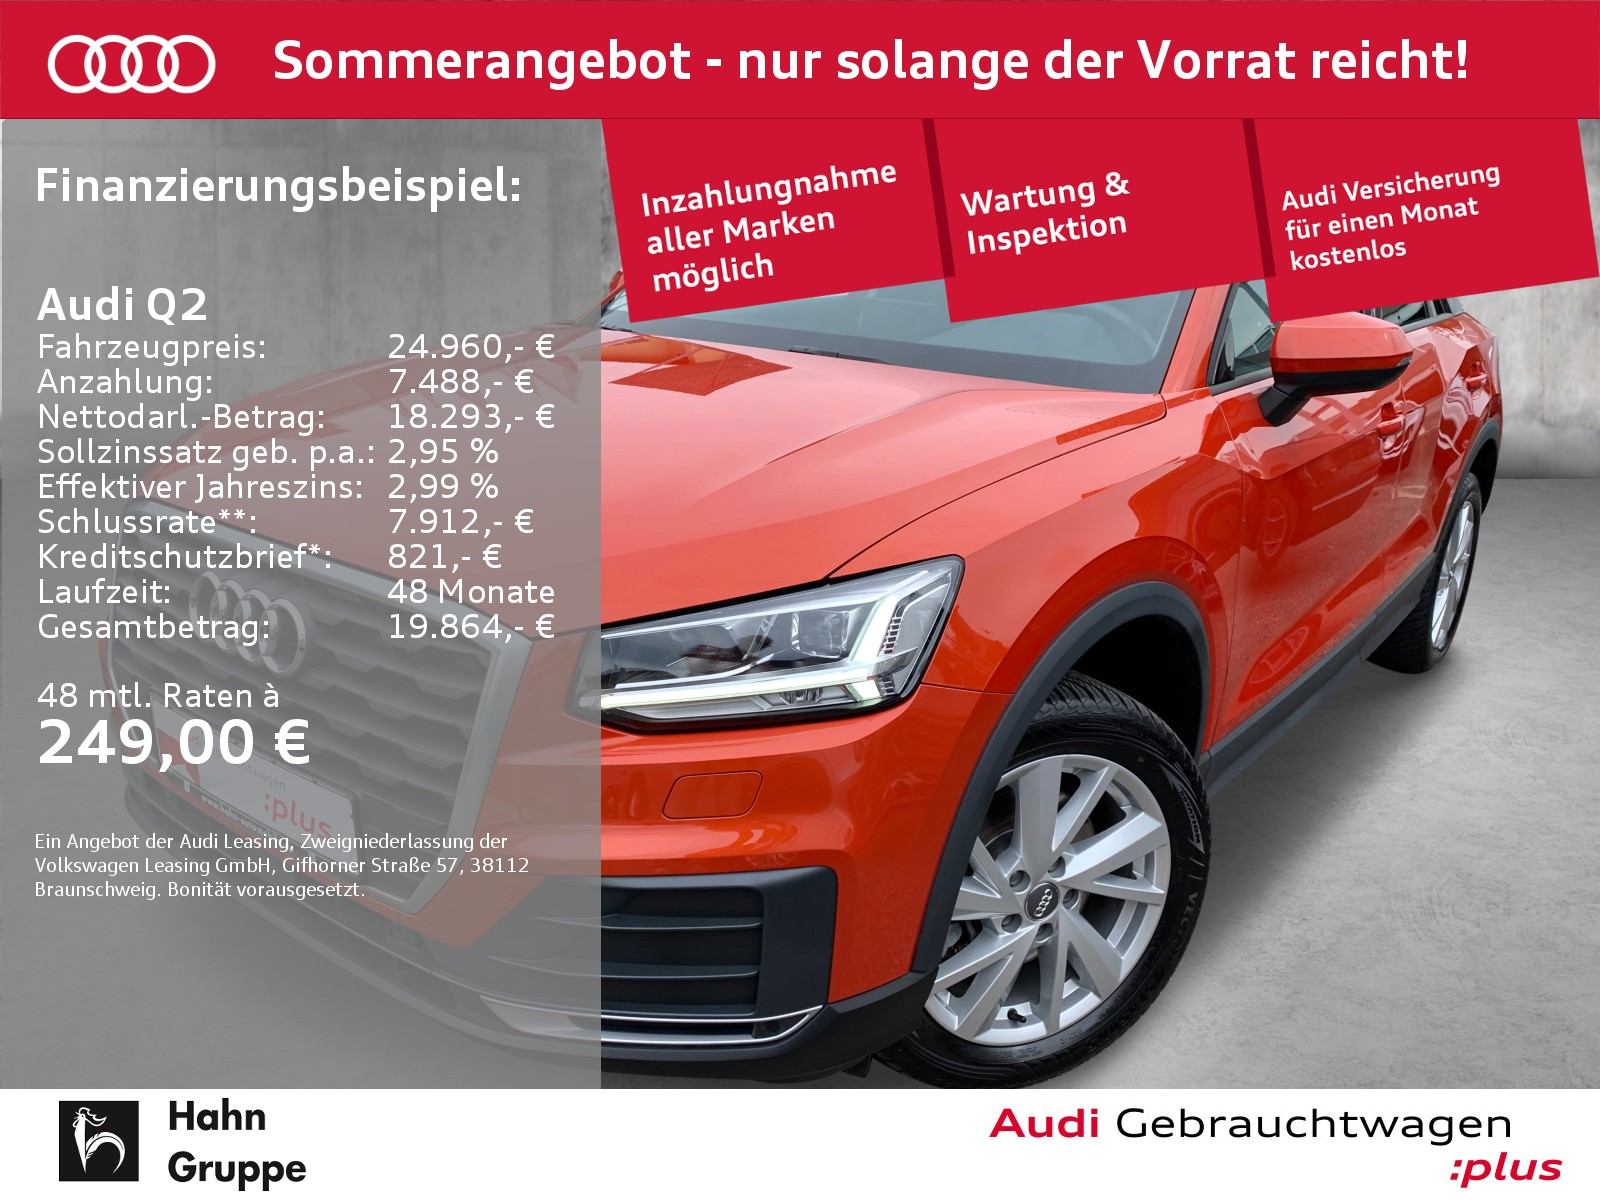 Audi Q2 1.4 TFSI S-trc Navi LED Sitzh Einpark Klima, Jahr 2018, Benzin